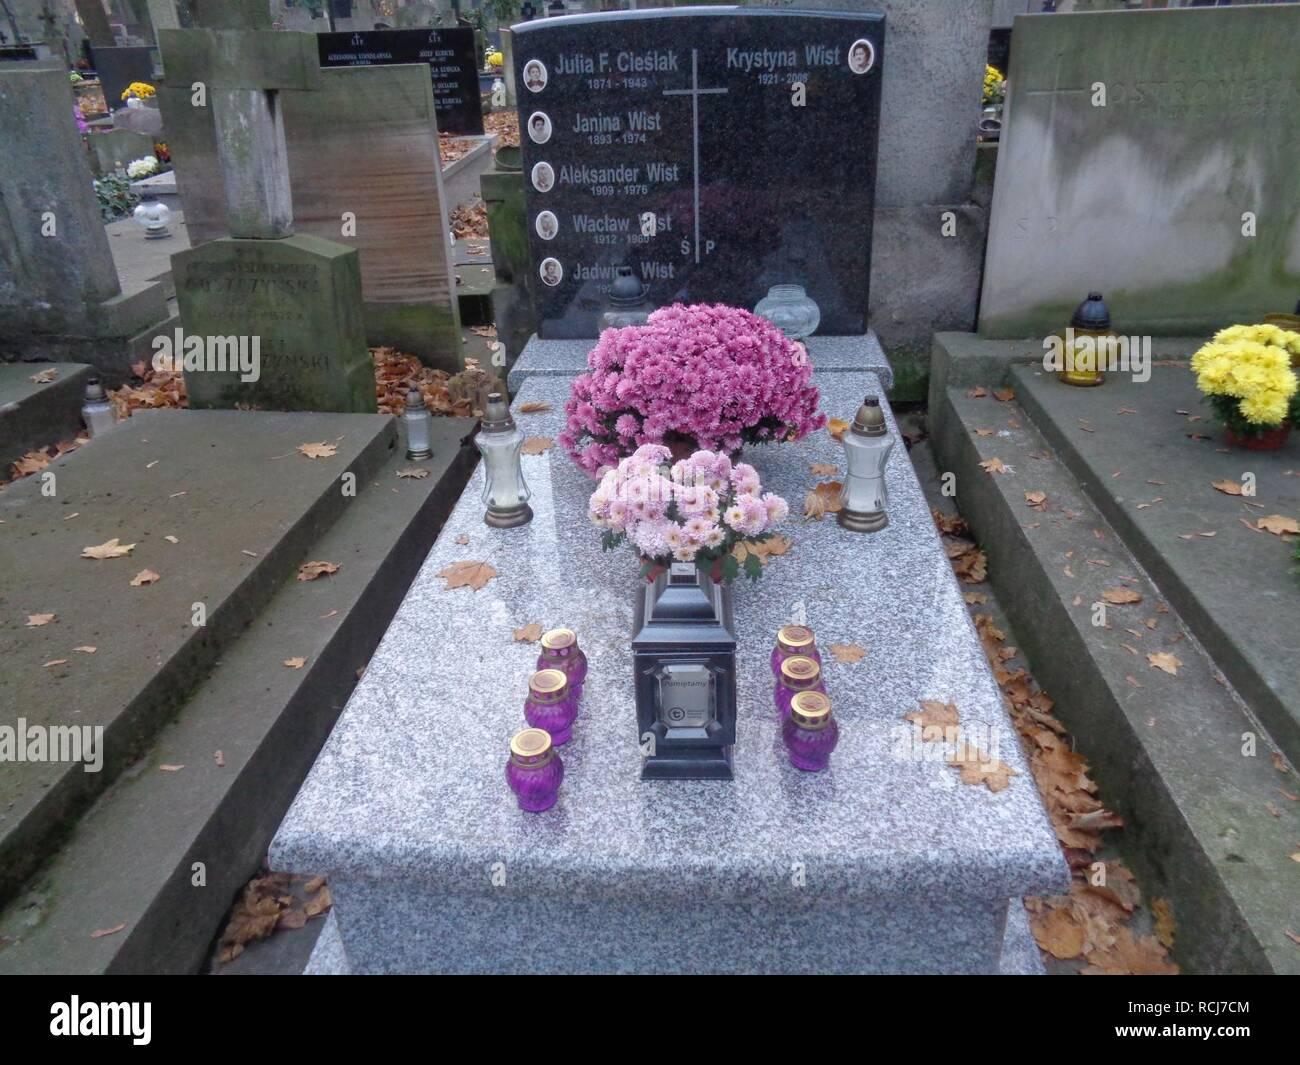 Aleksander Wist grób. - Stock Image